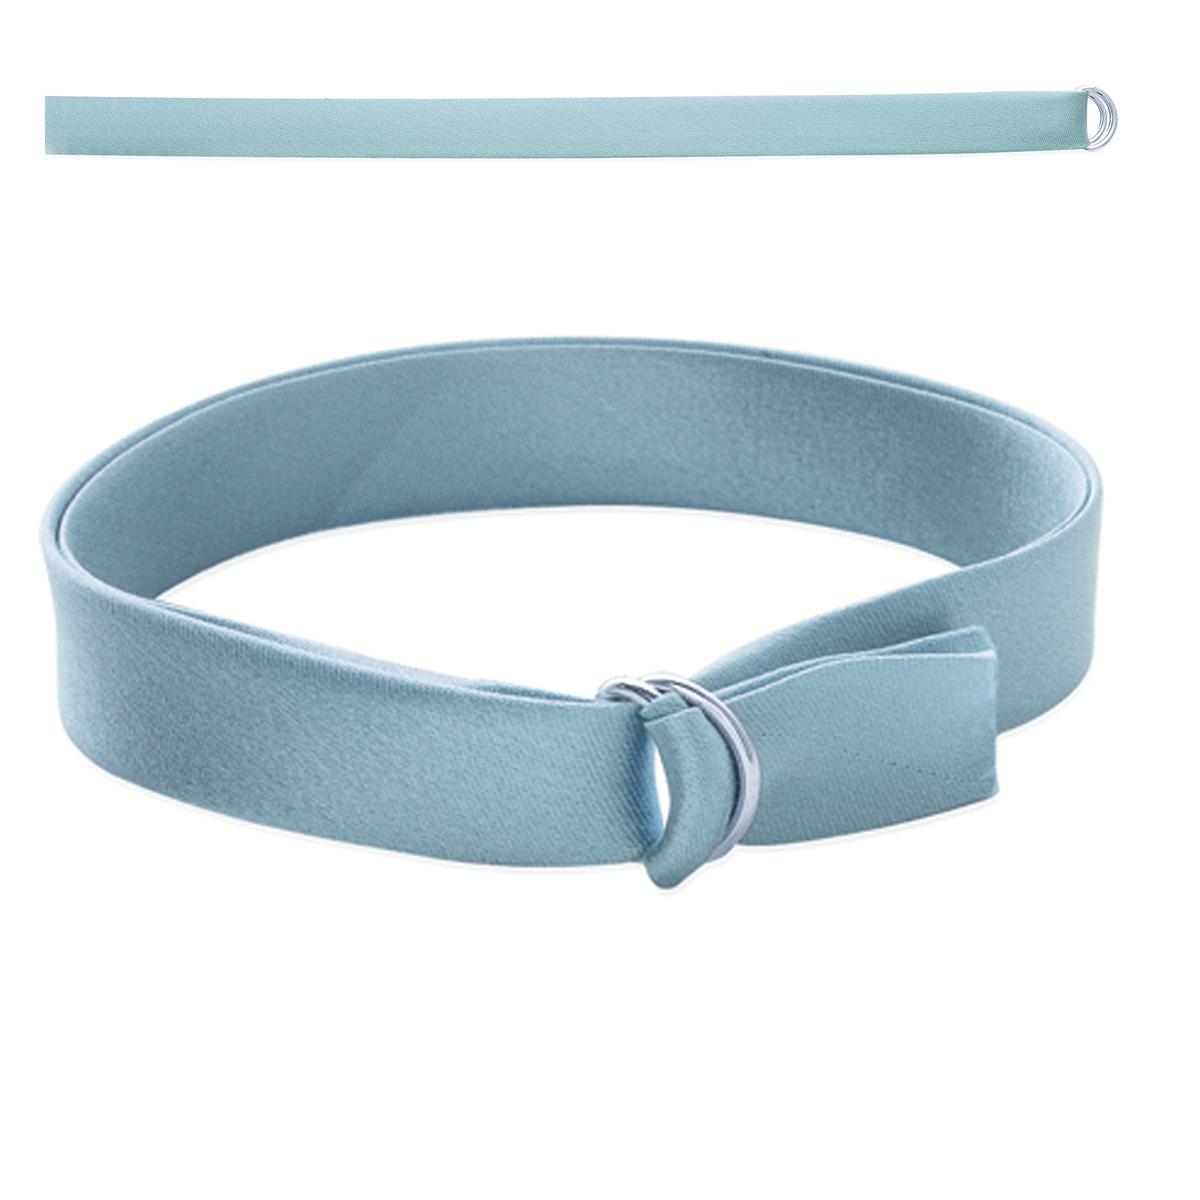 Bracelet \'Satin\' argenté - 1 cm - [I8056]